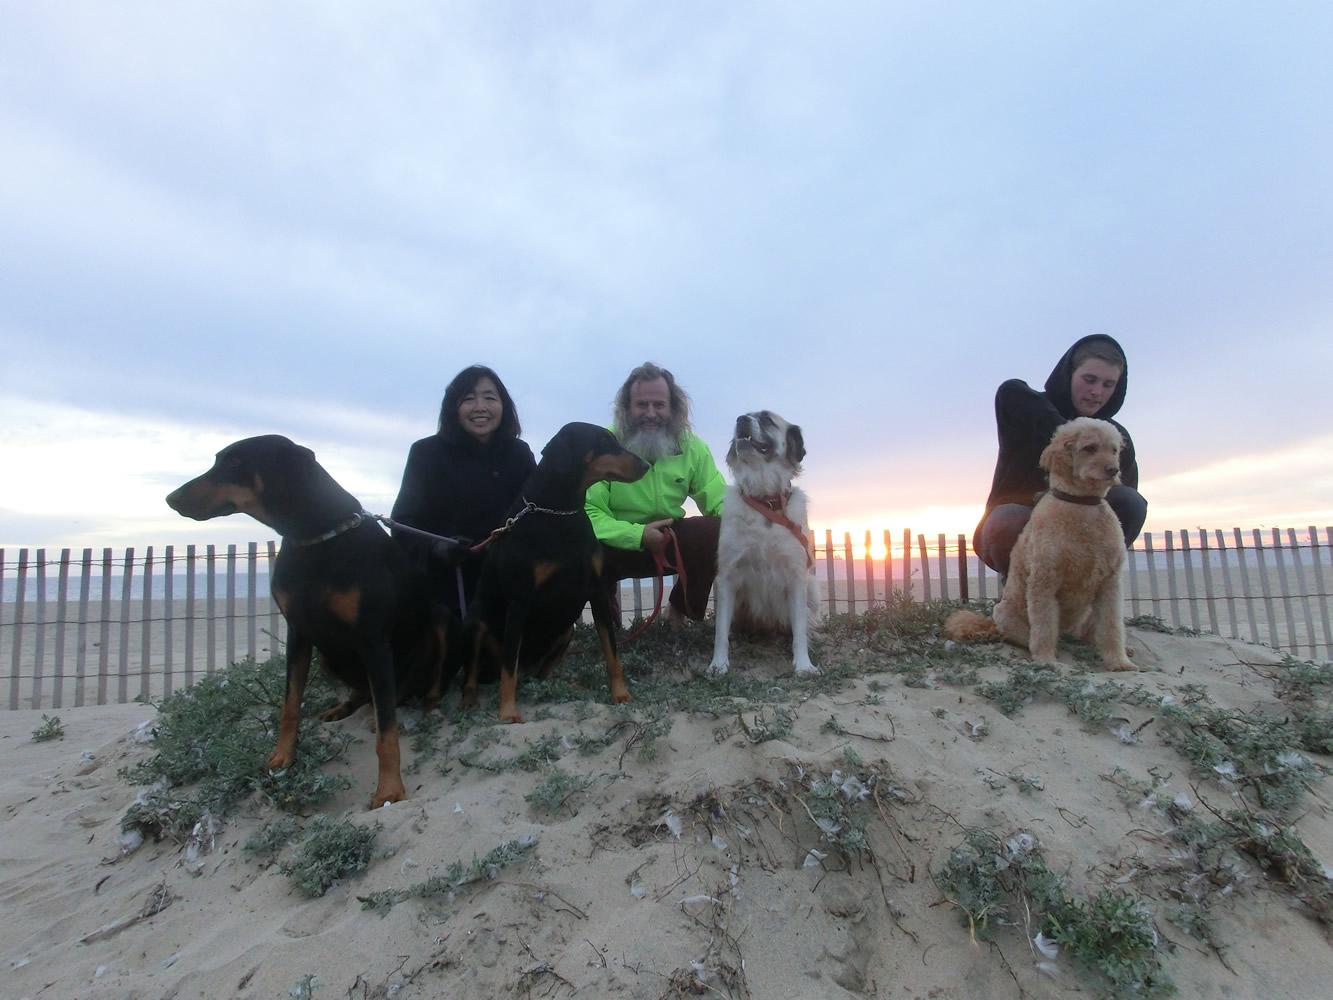 Willie, Alice, Phoebe, Ken Bob, Herman, Trevor, Kasey, Bolsa Chica State Beach, Huntington Beach CA